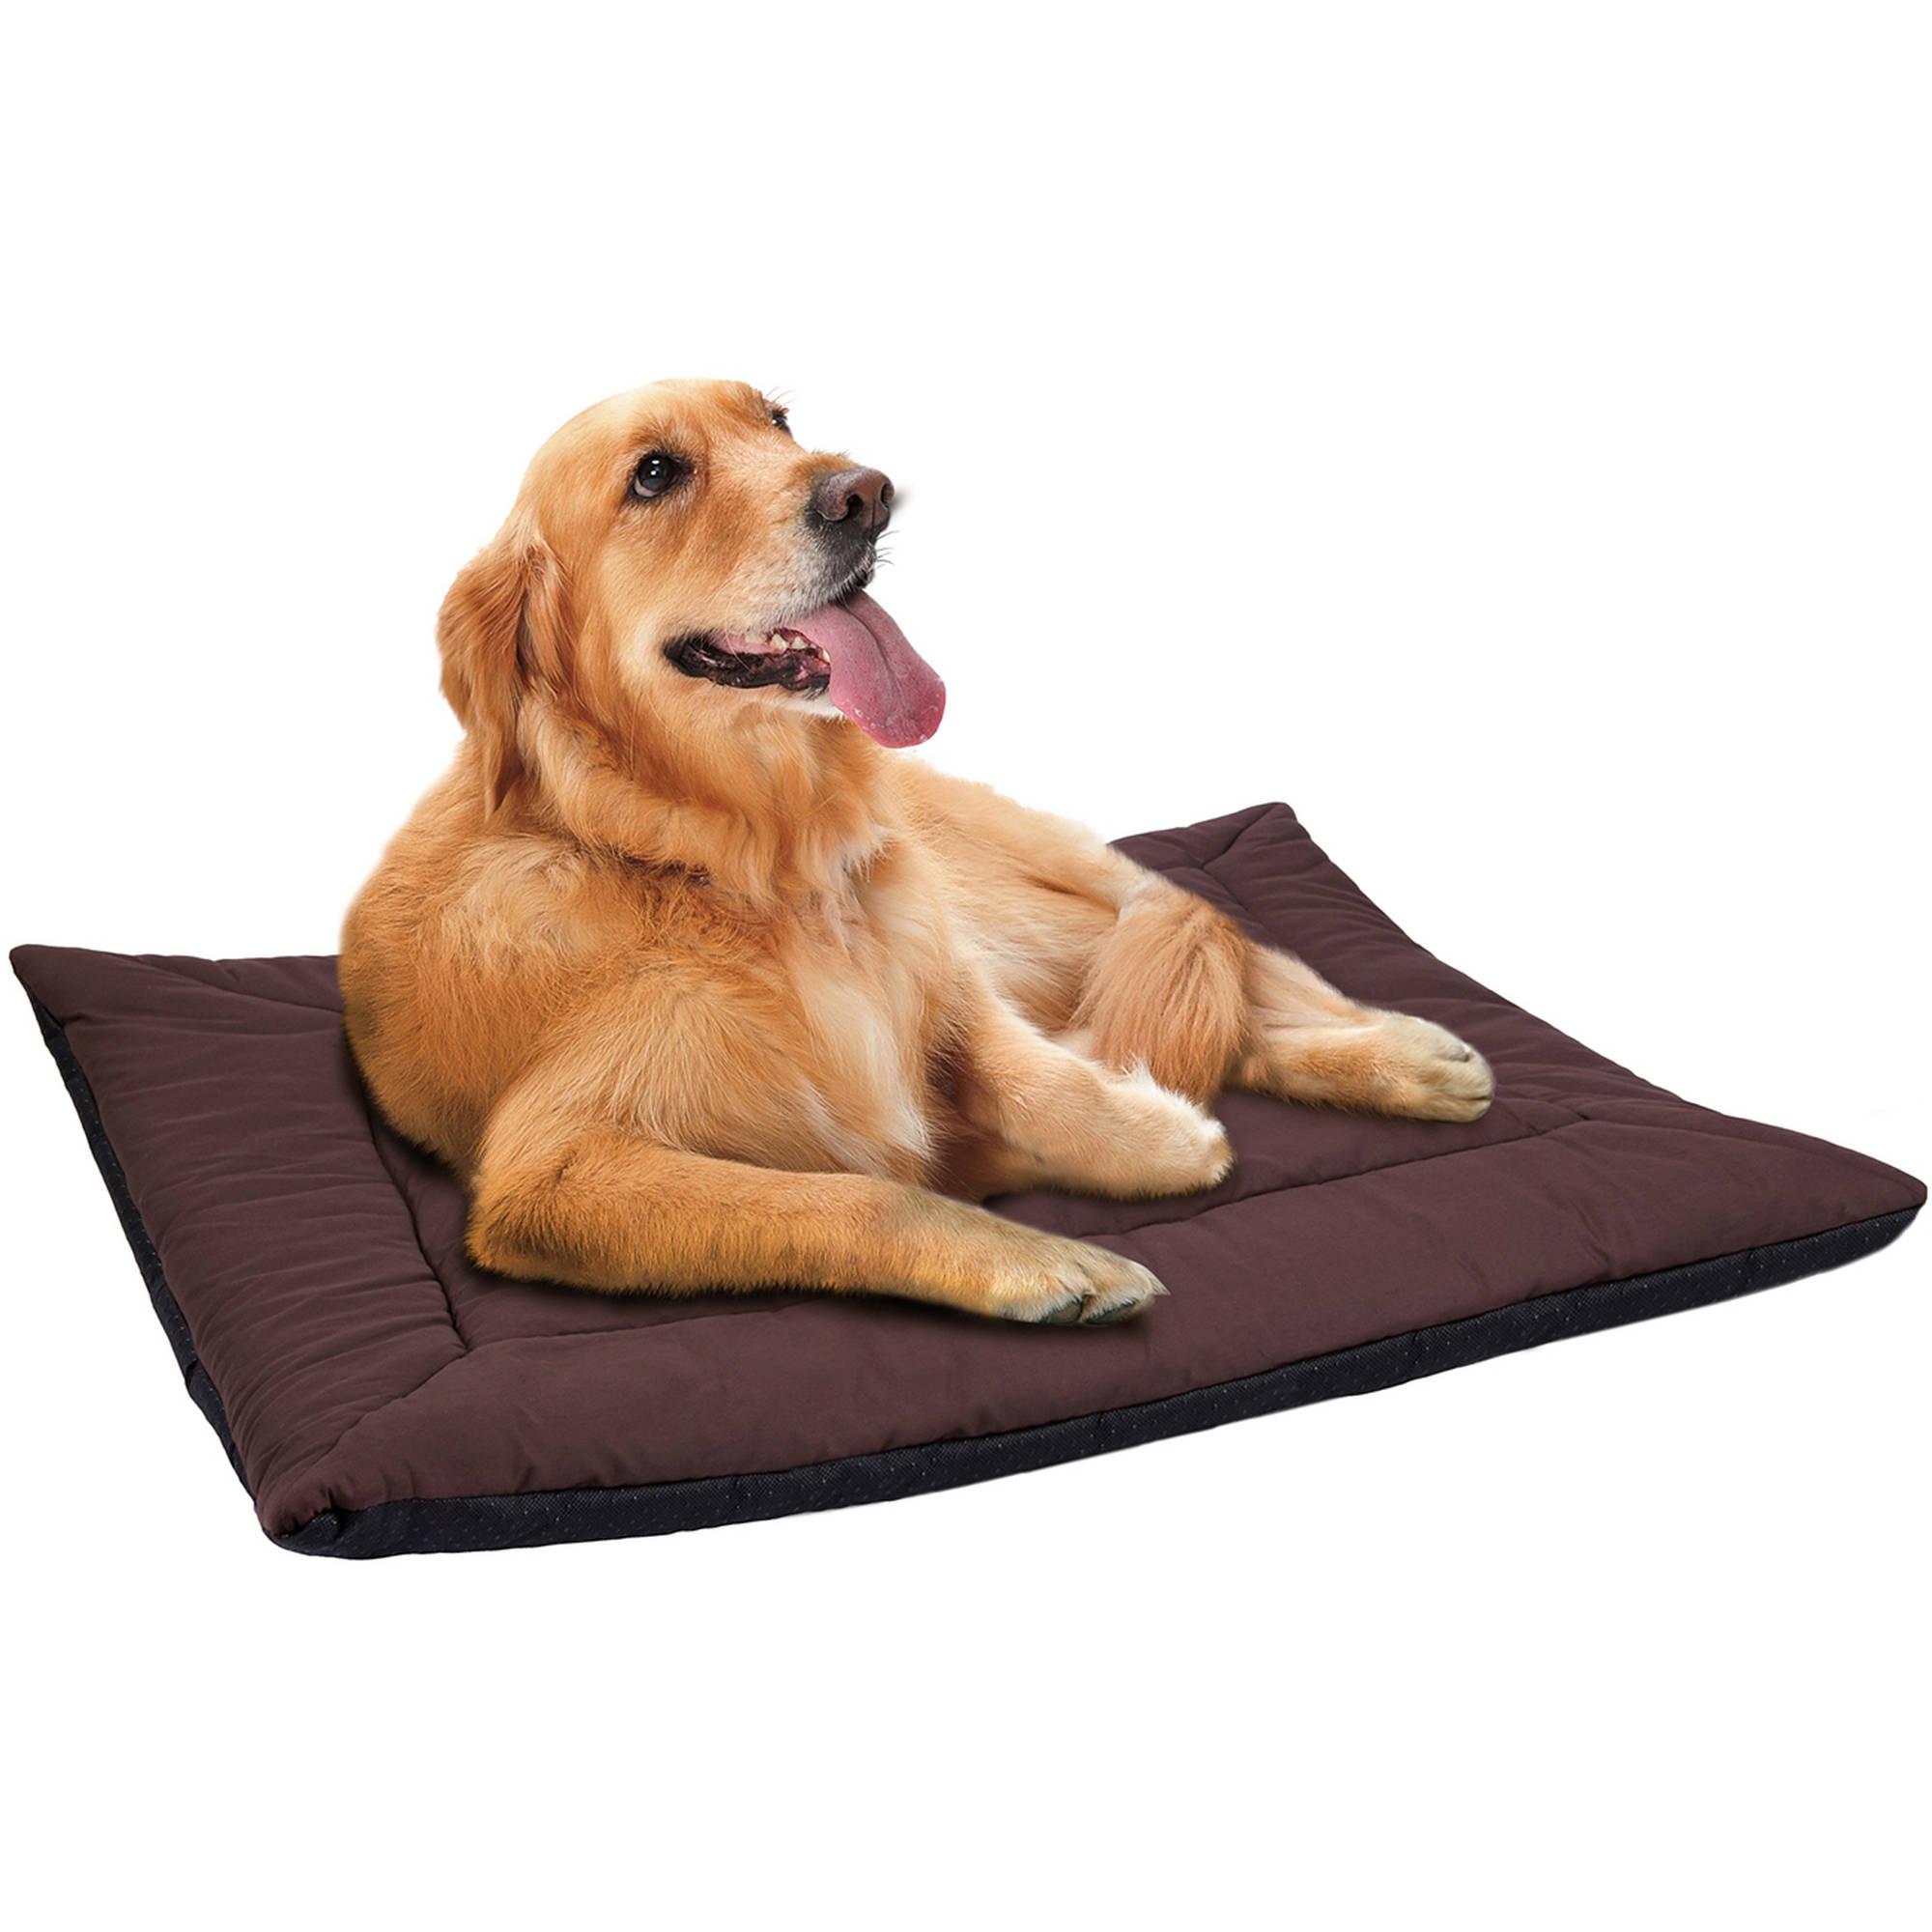 OxGord Self Warming Pet Bed Cushion Pad, Soft Cozy Mat